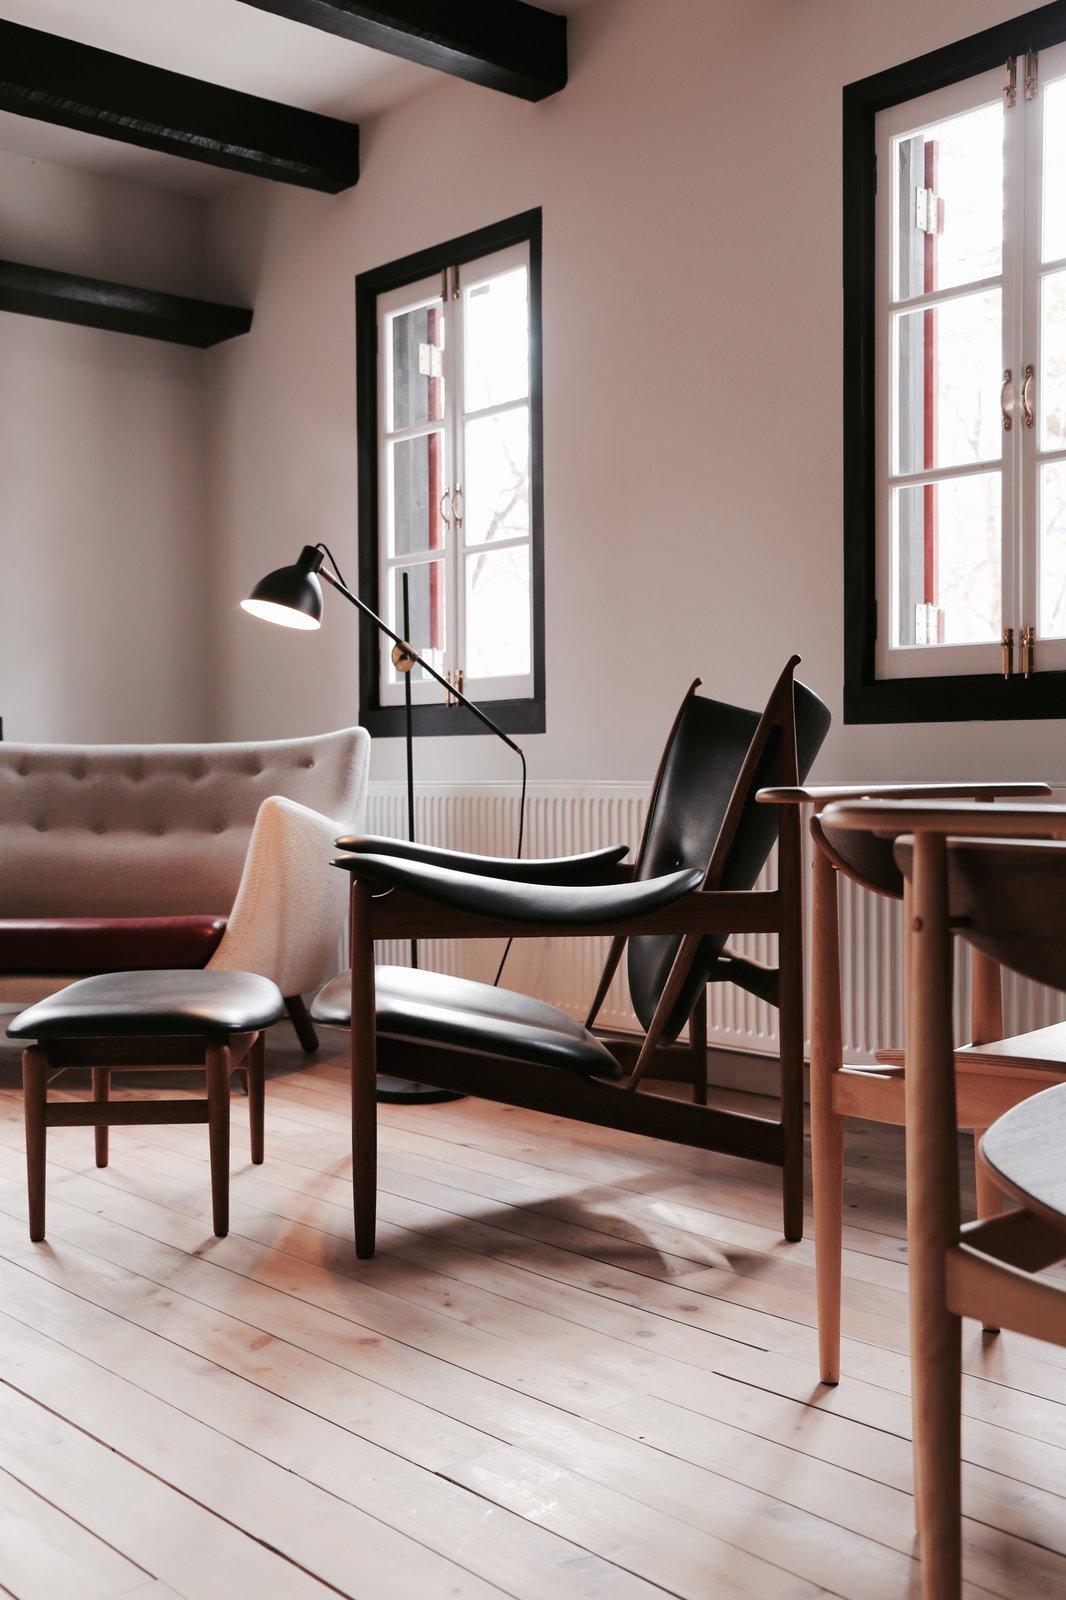 Finn Juhl Design Hotel Opens in Nagano, Japan - Photo 3 of 5